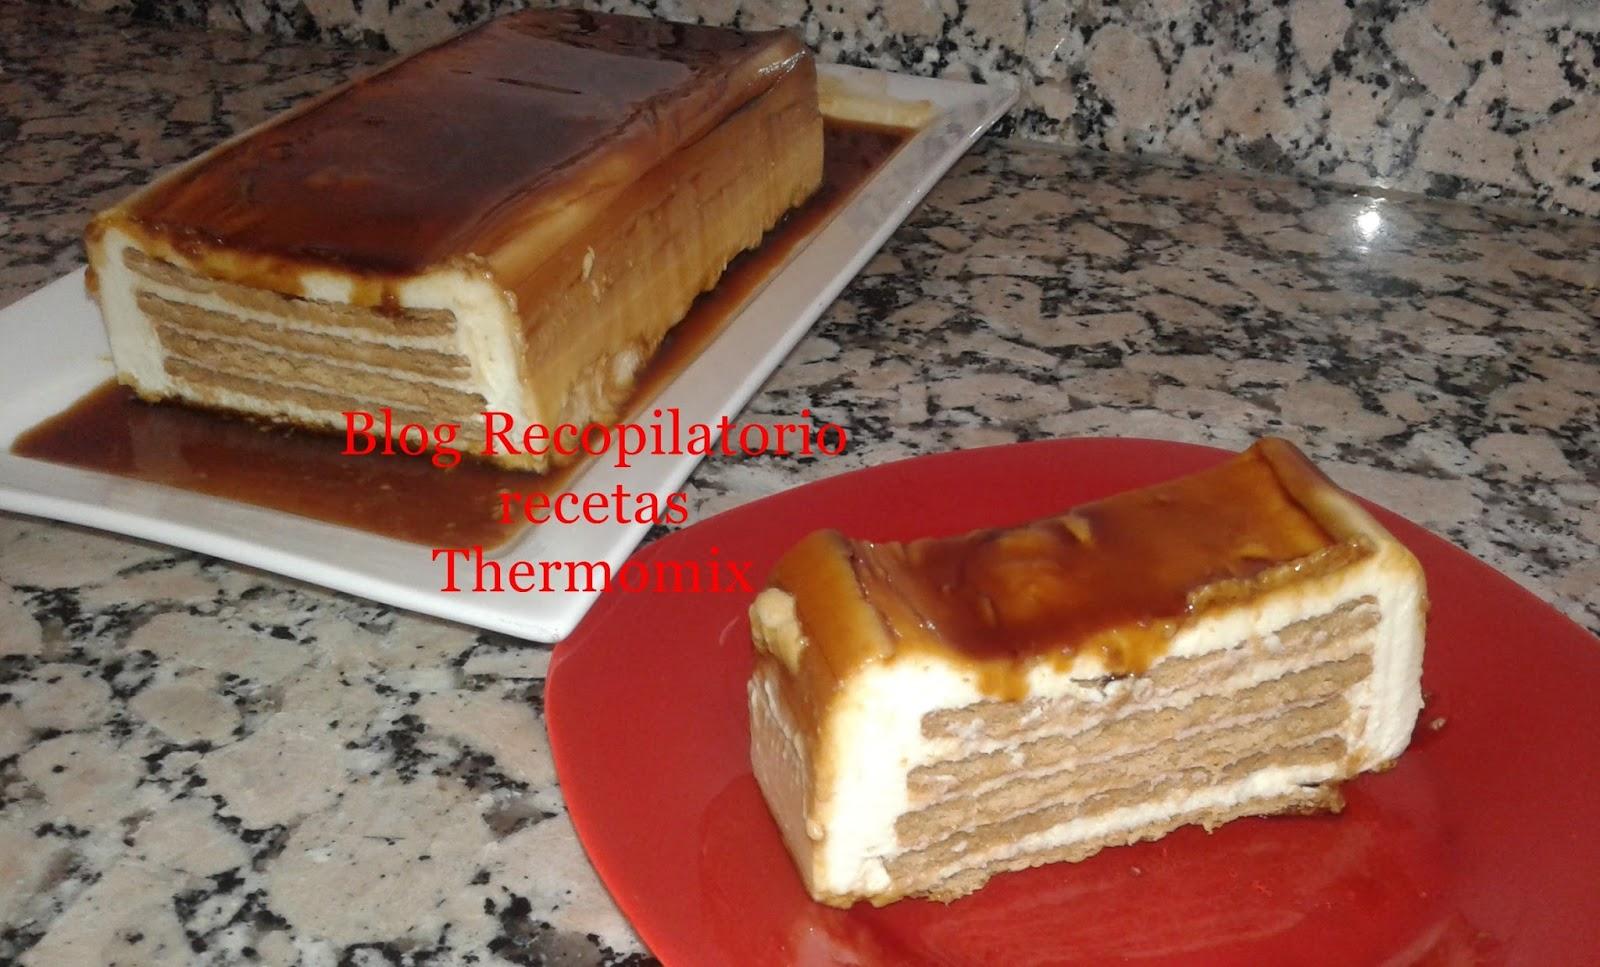 Recetas con queso philadelphia en thermomix